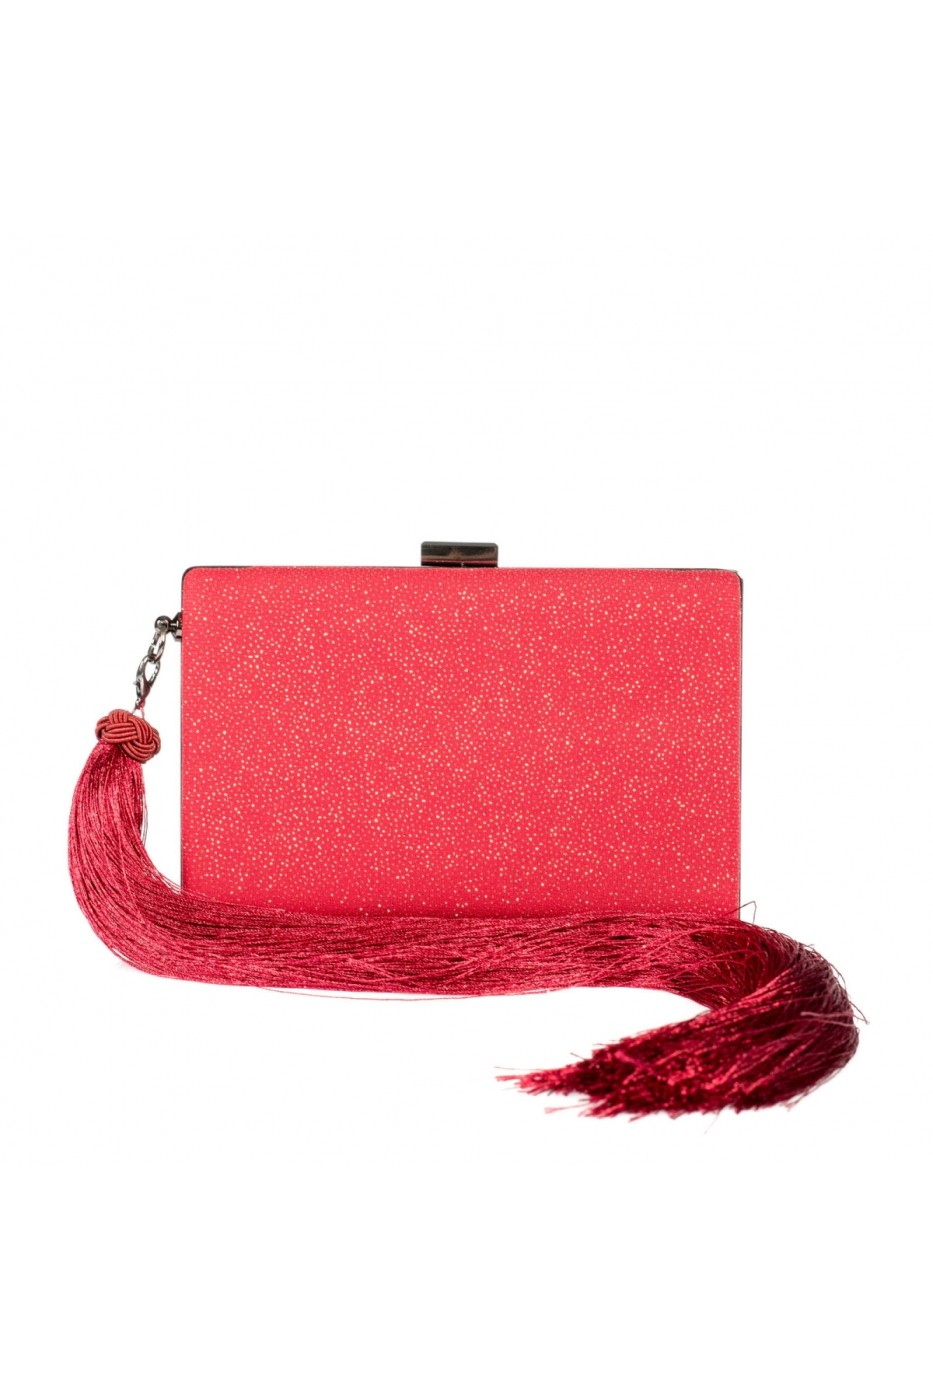 174aff9f8814 Nissa Borítéktáska nsexpl5011/Rosu Piros - FashionUP!